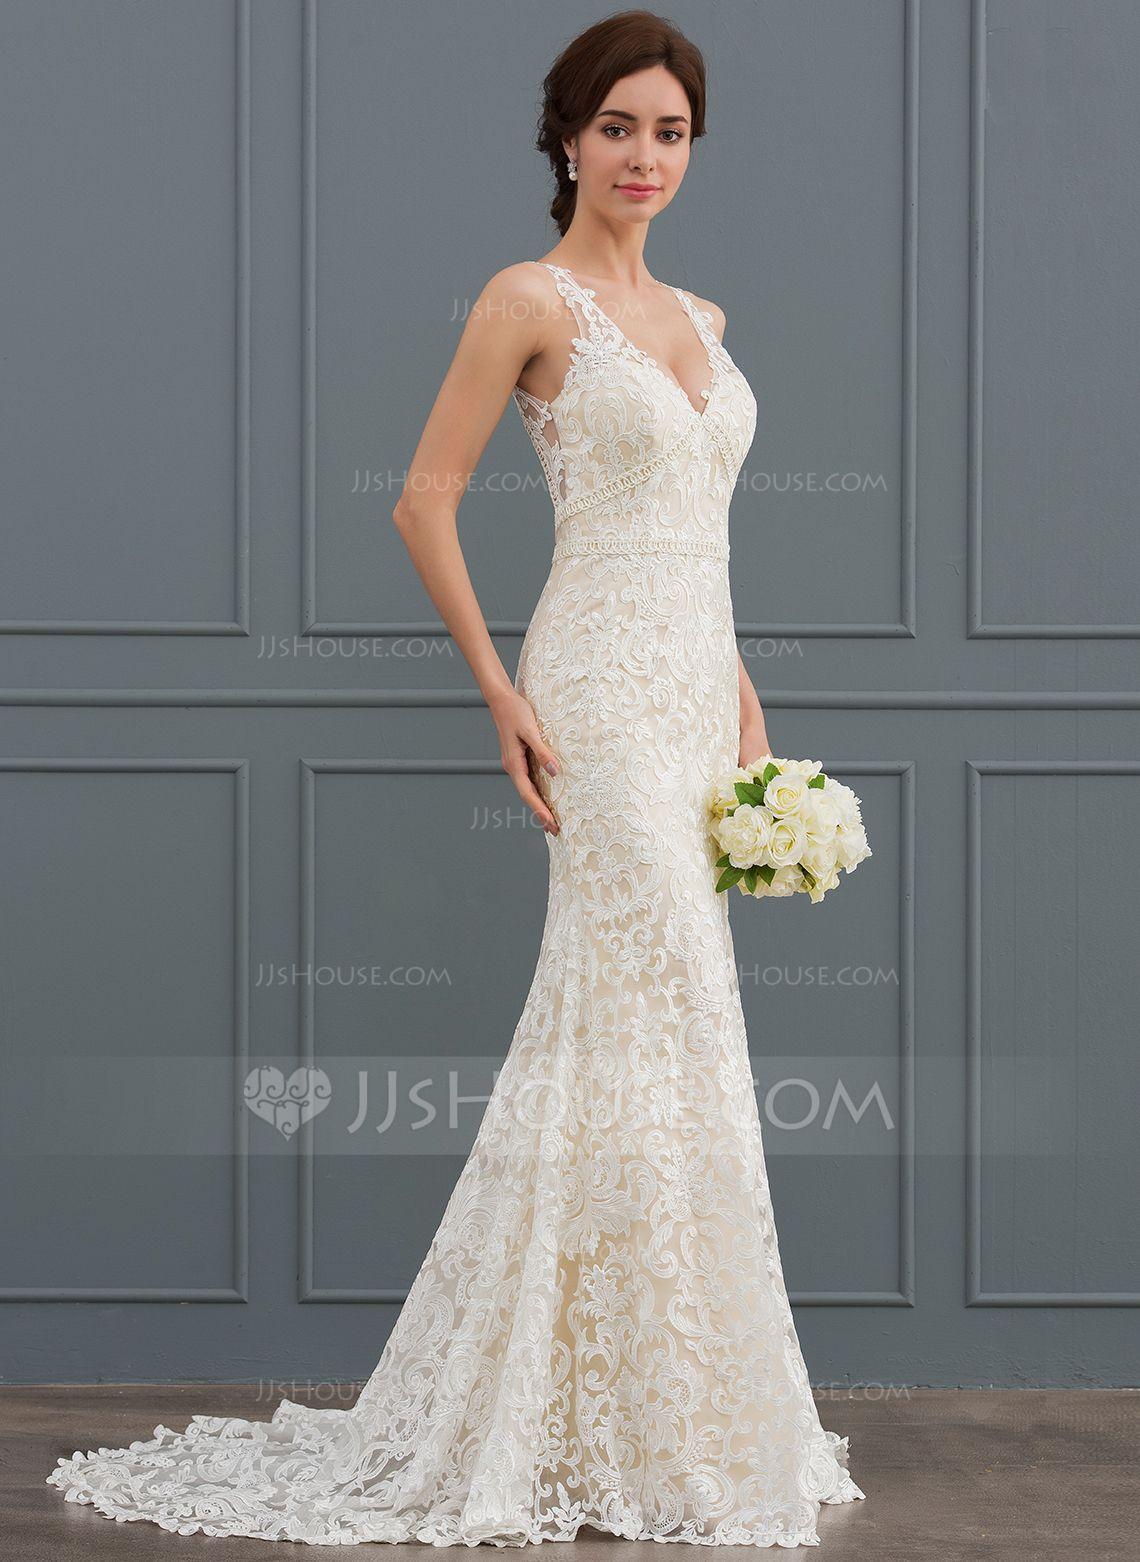 Us 368 00 Trumpet Mermaid V Neck Sweep Train Lace Wedding Dress Jj S House Wedding Dresses Wedding Dresses Lace Wedding Dresses Under 500 [ 1562 x 1140 Pixel ]